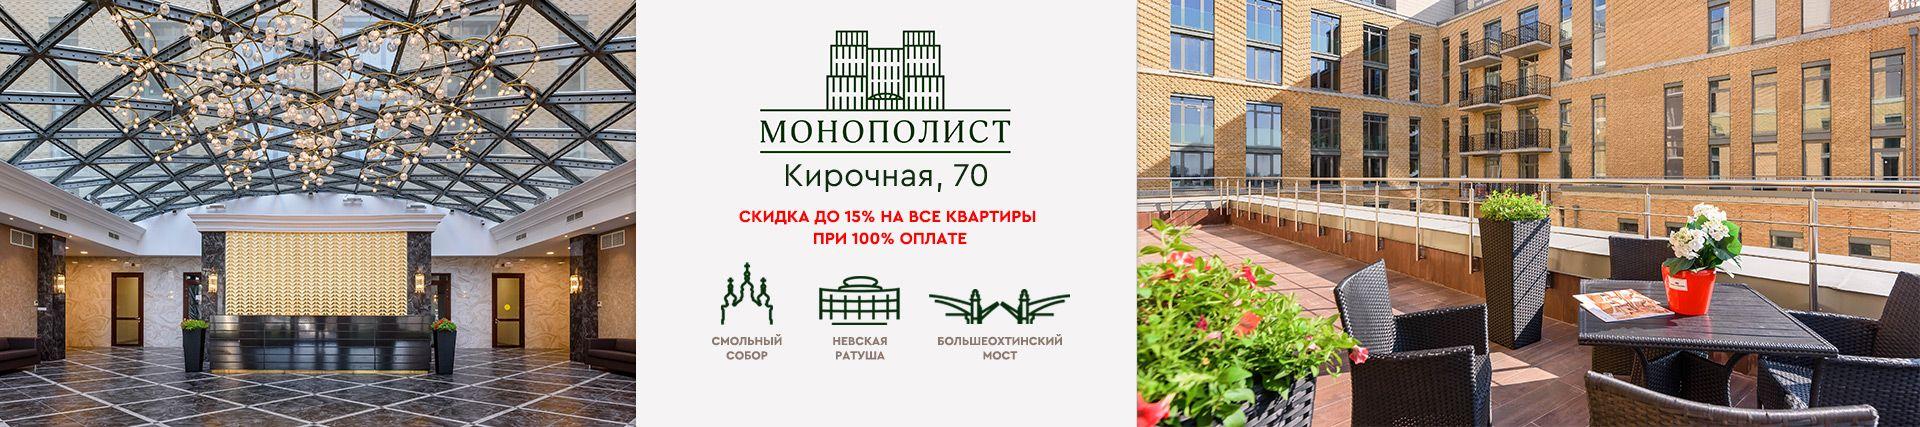 https://evspb.ru/wp-content/uploads/2019/09/dm-rew-04.jpg